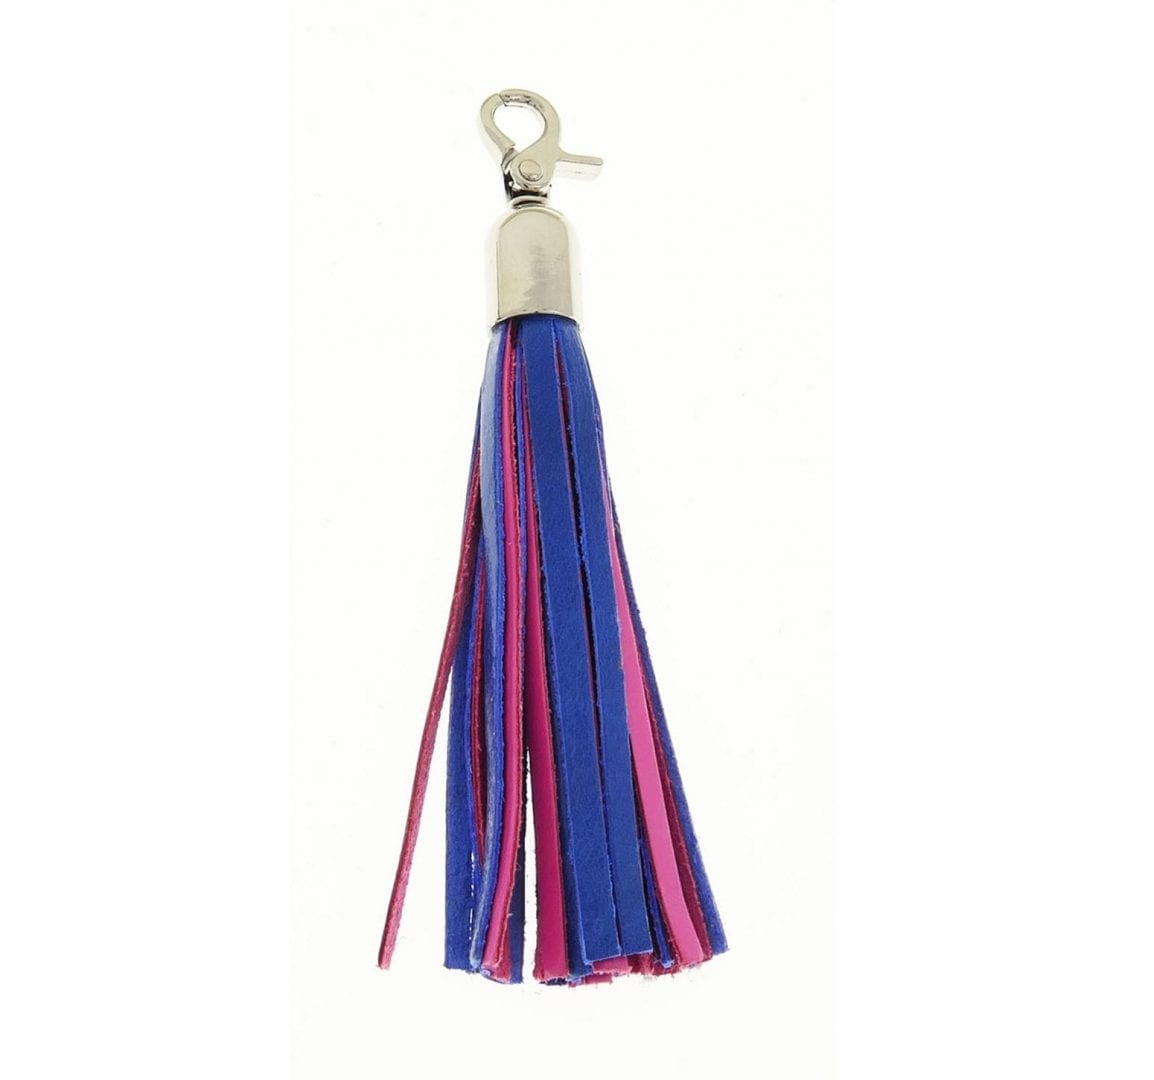 pink blue leather tassel purse charm